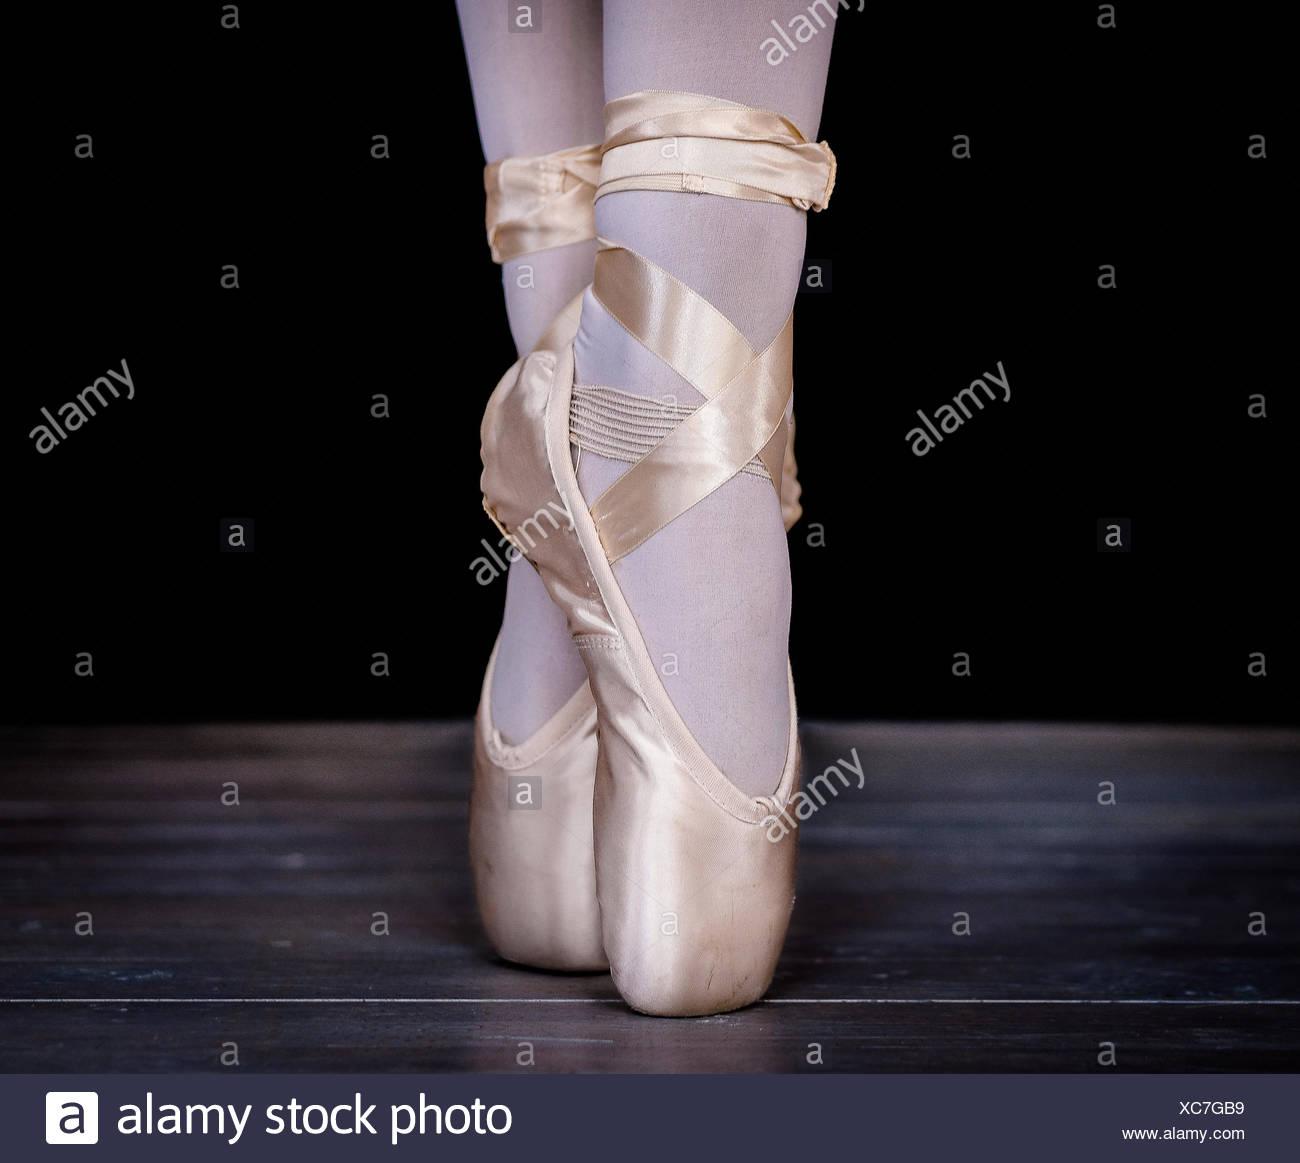 Ballerina standing en pointe - Stock Image